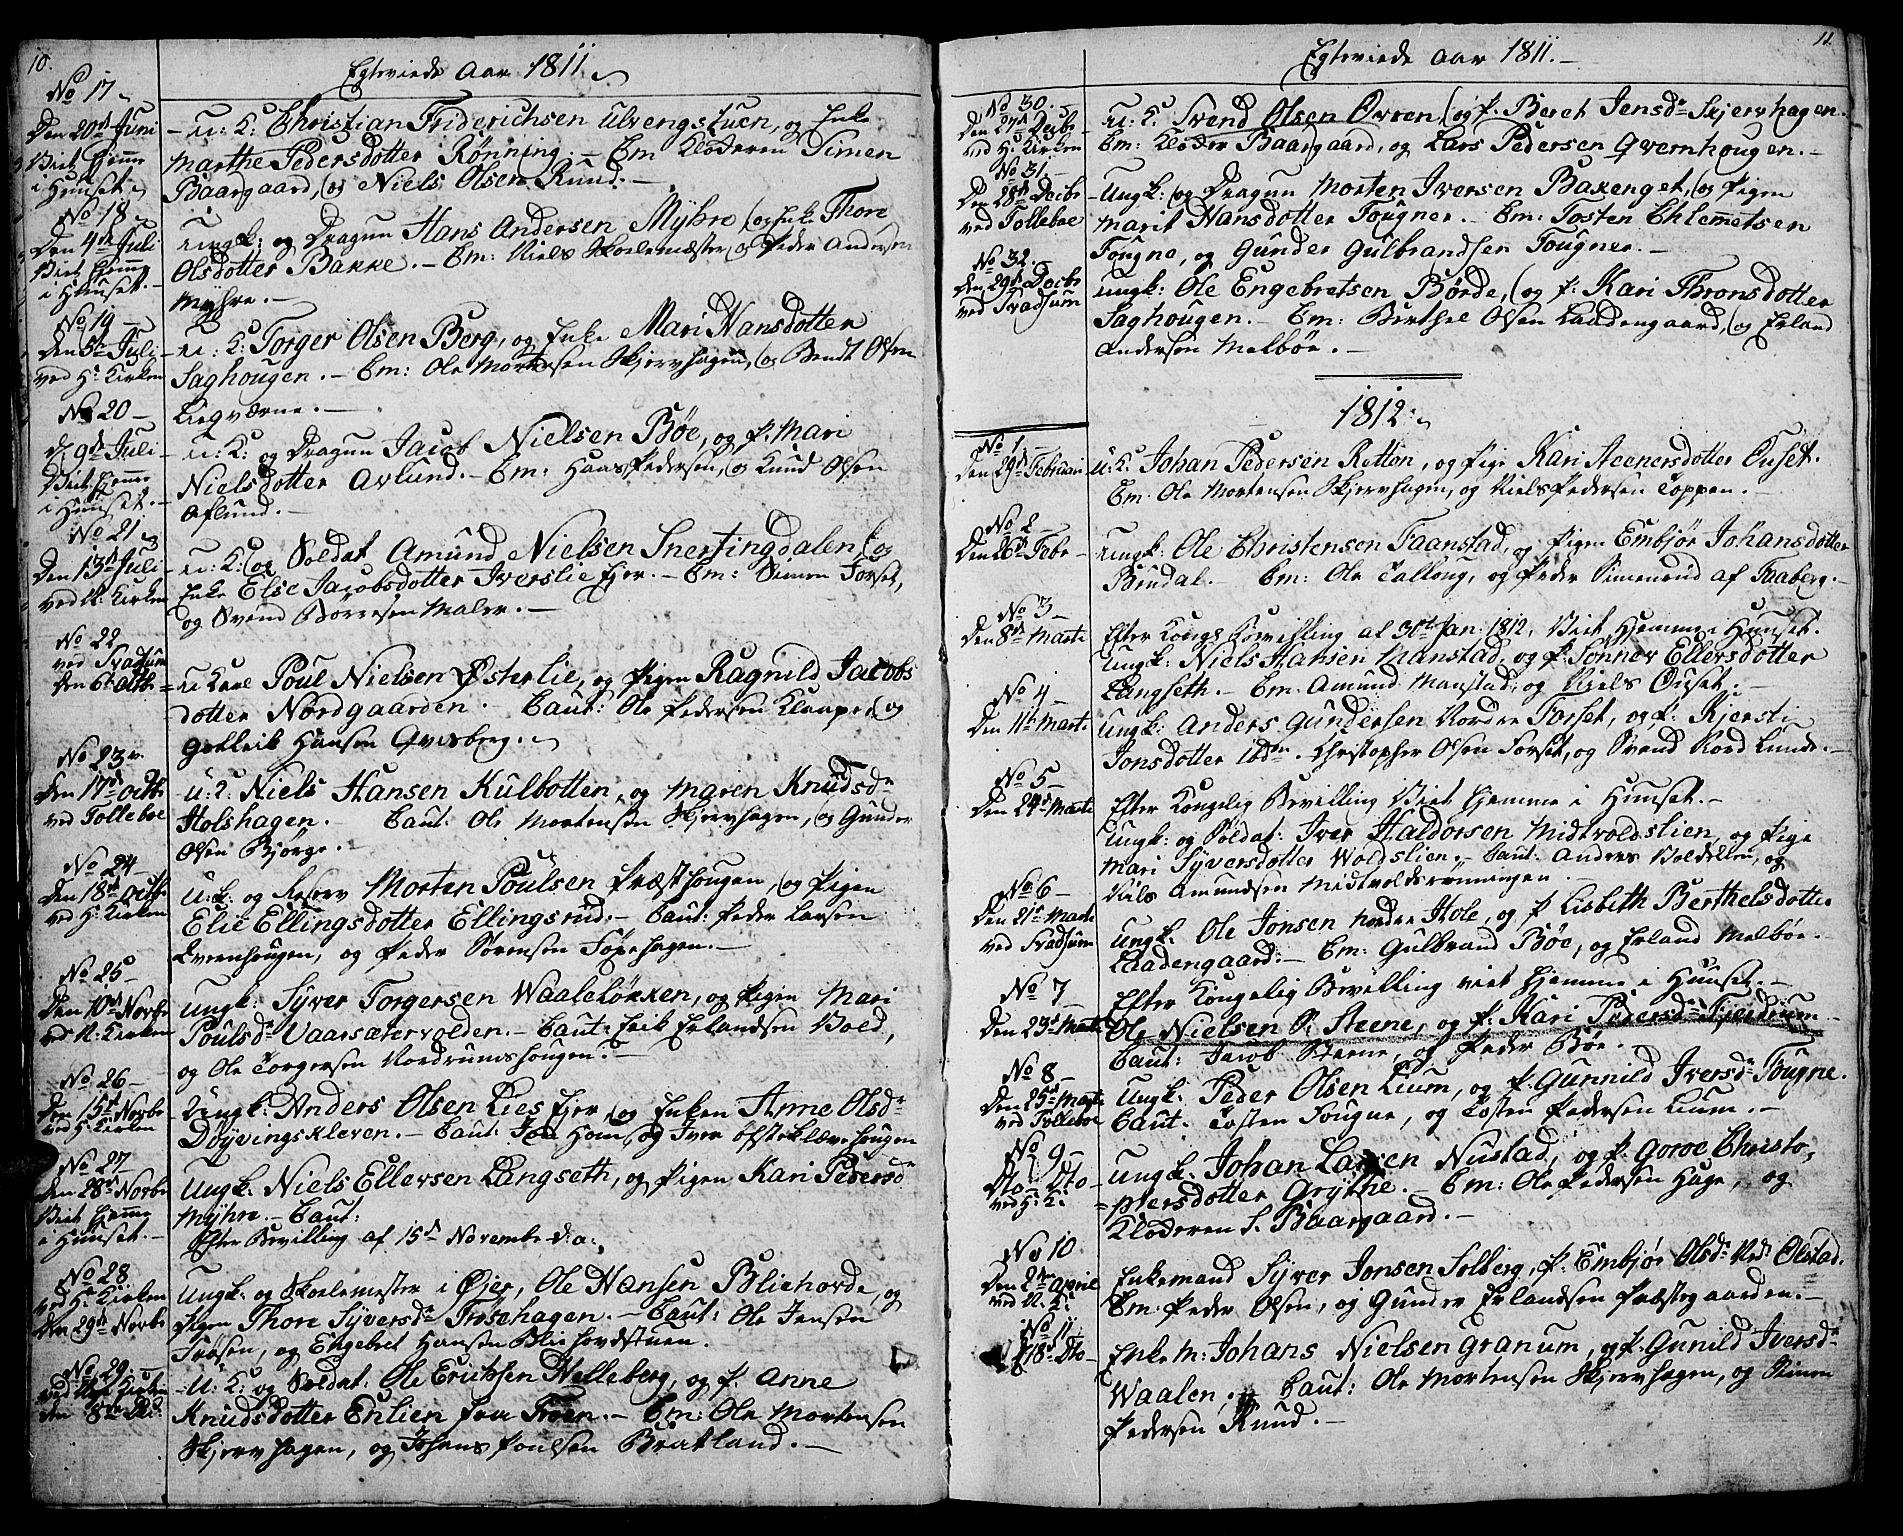 SAH, Gausdal prestekontor, Ministerialbok nr. 4, 1809-1817, s. 10-11